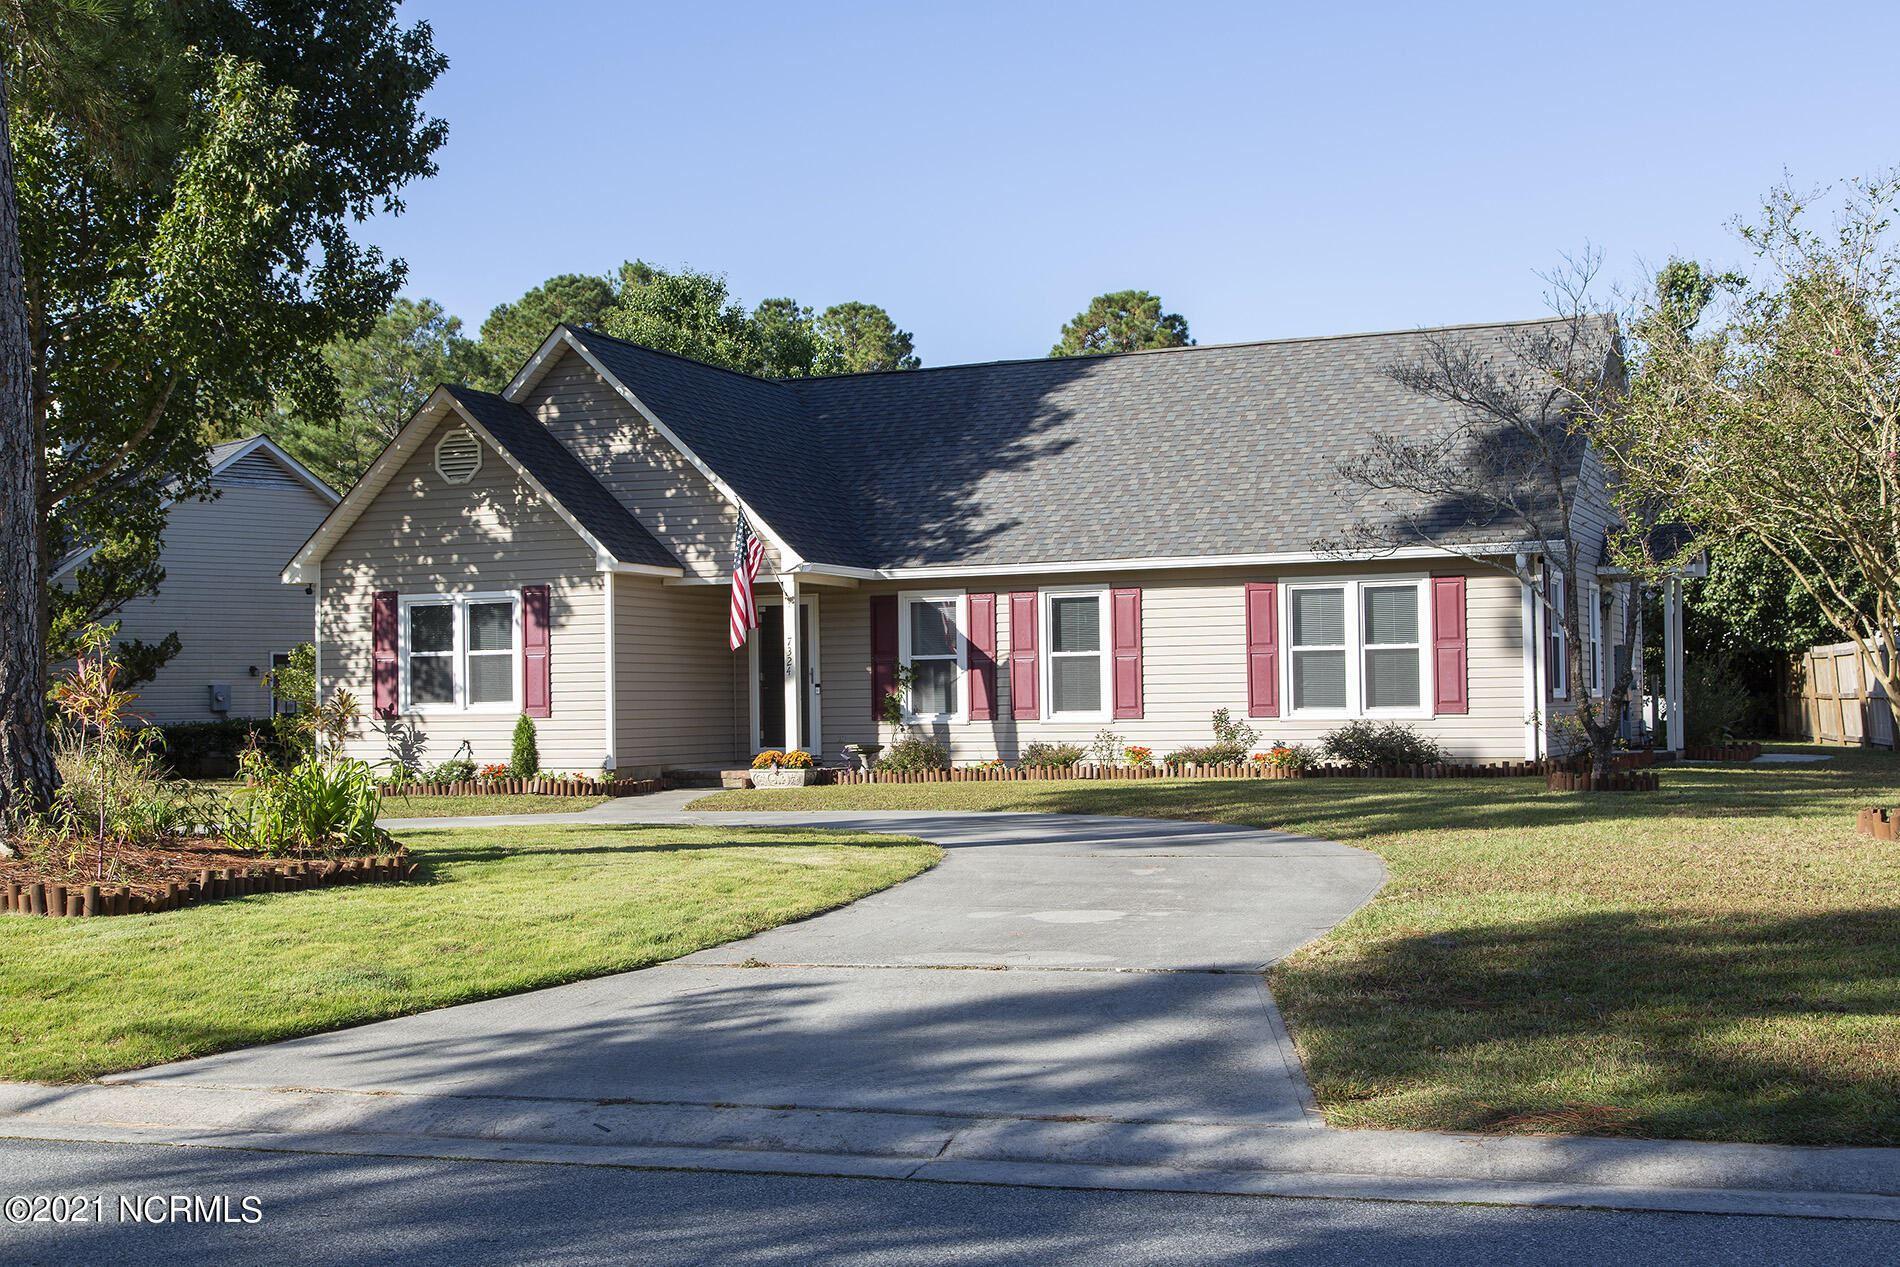 Photo of 7324 Quail Woods Road, Wilmington, NC 28411 (MLS # 100296143)